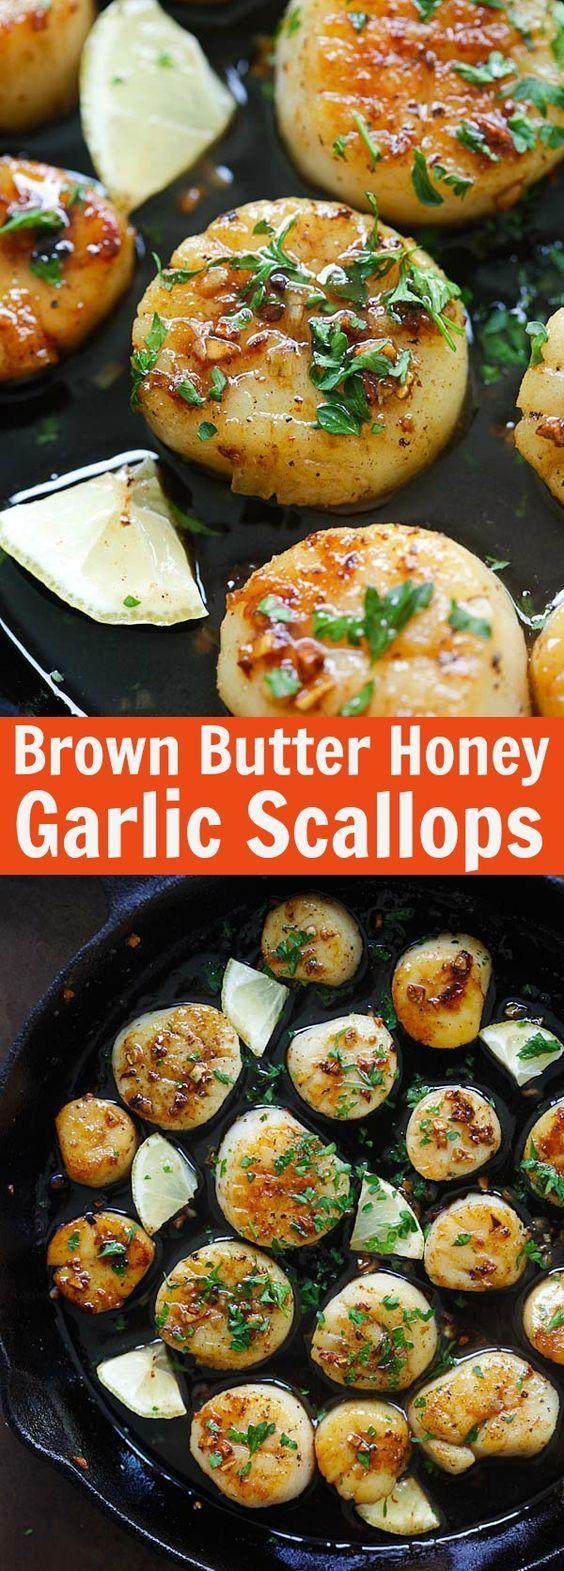 Brown Butter Honey Garlic Scallops – crazy delicious seared scallops with brown butter and honey garlic sauce. The best scallops recipe ever | rasamalaysia.com